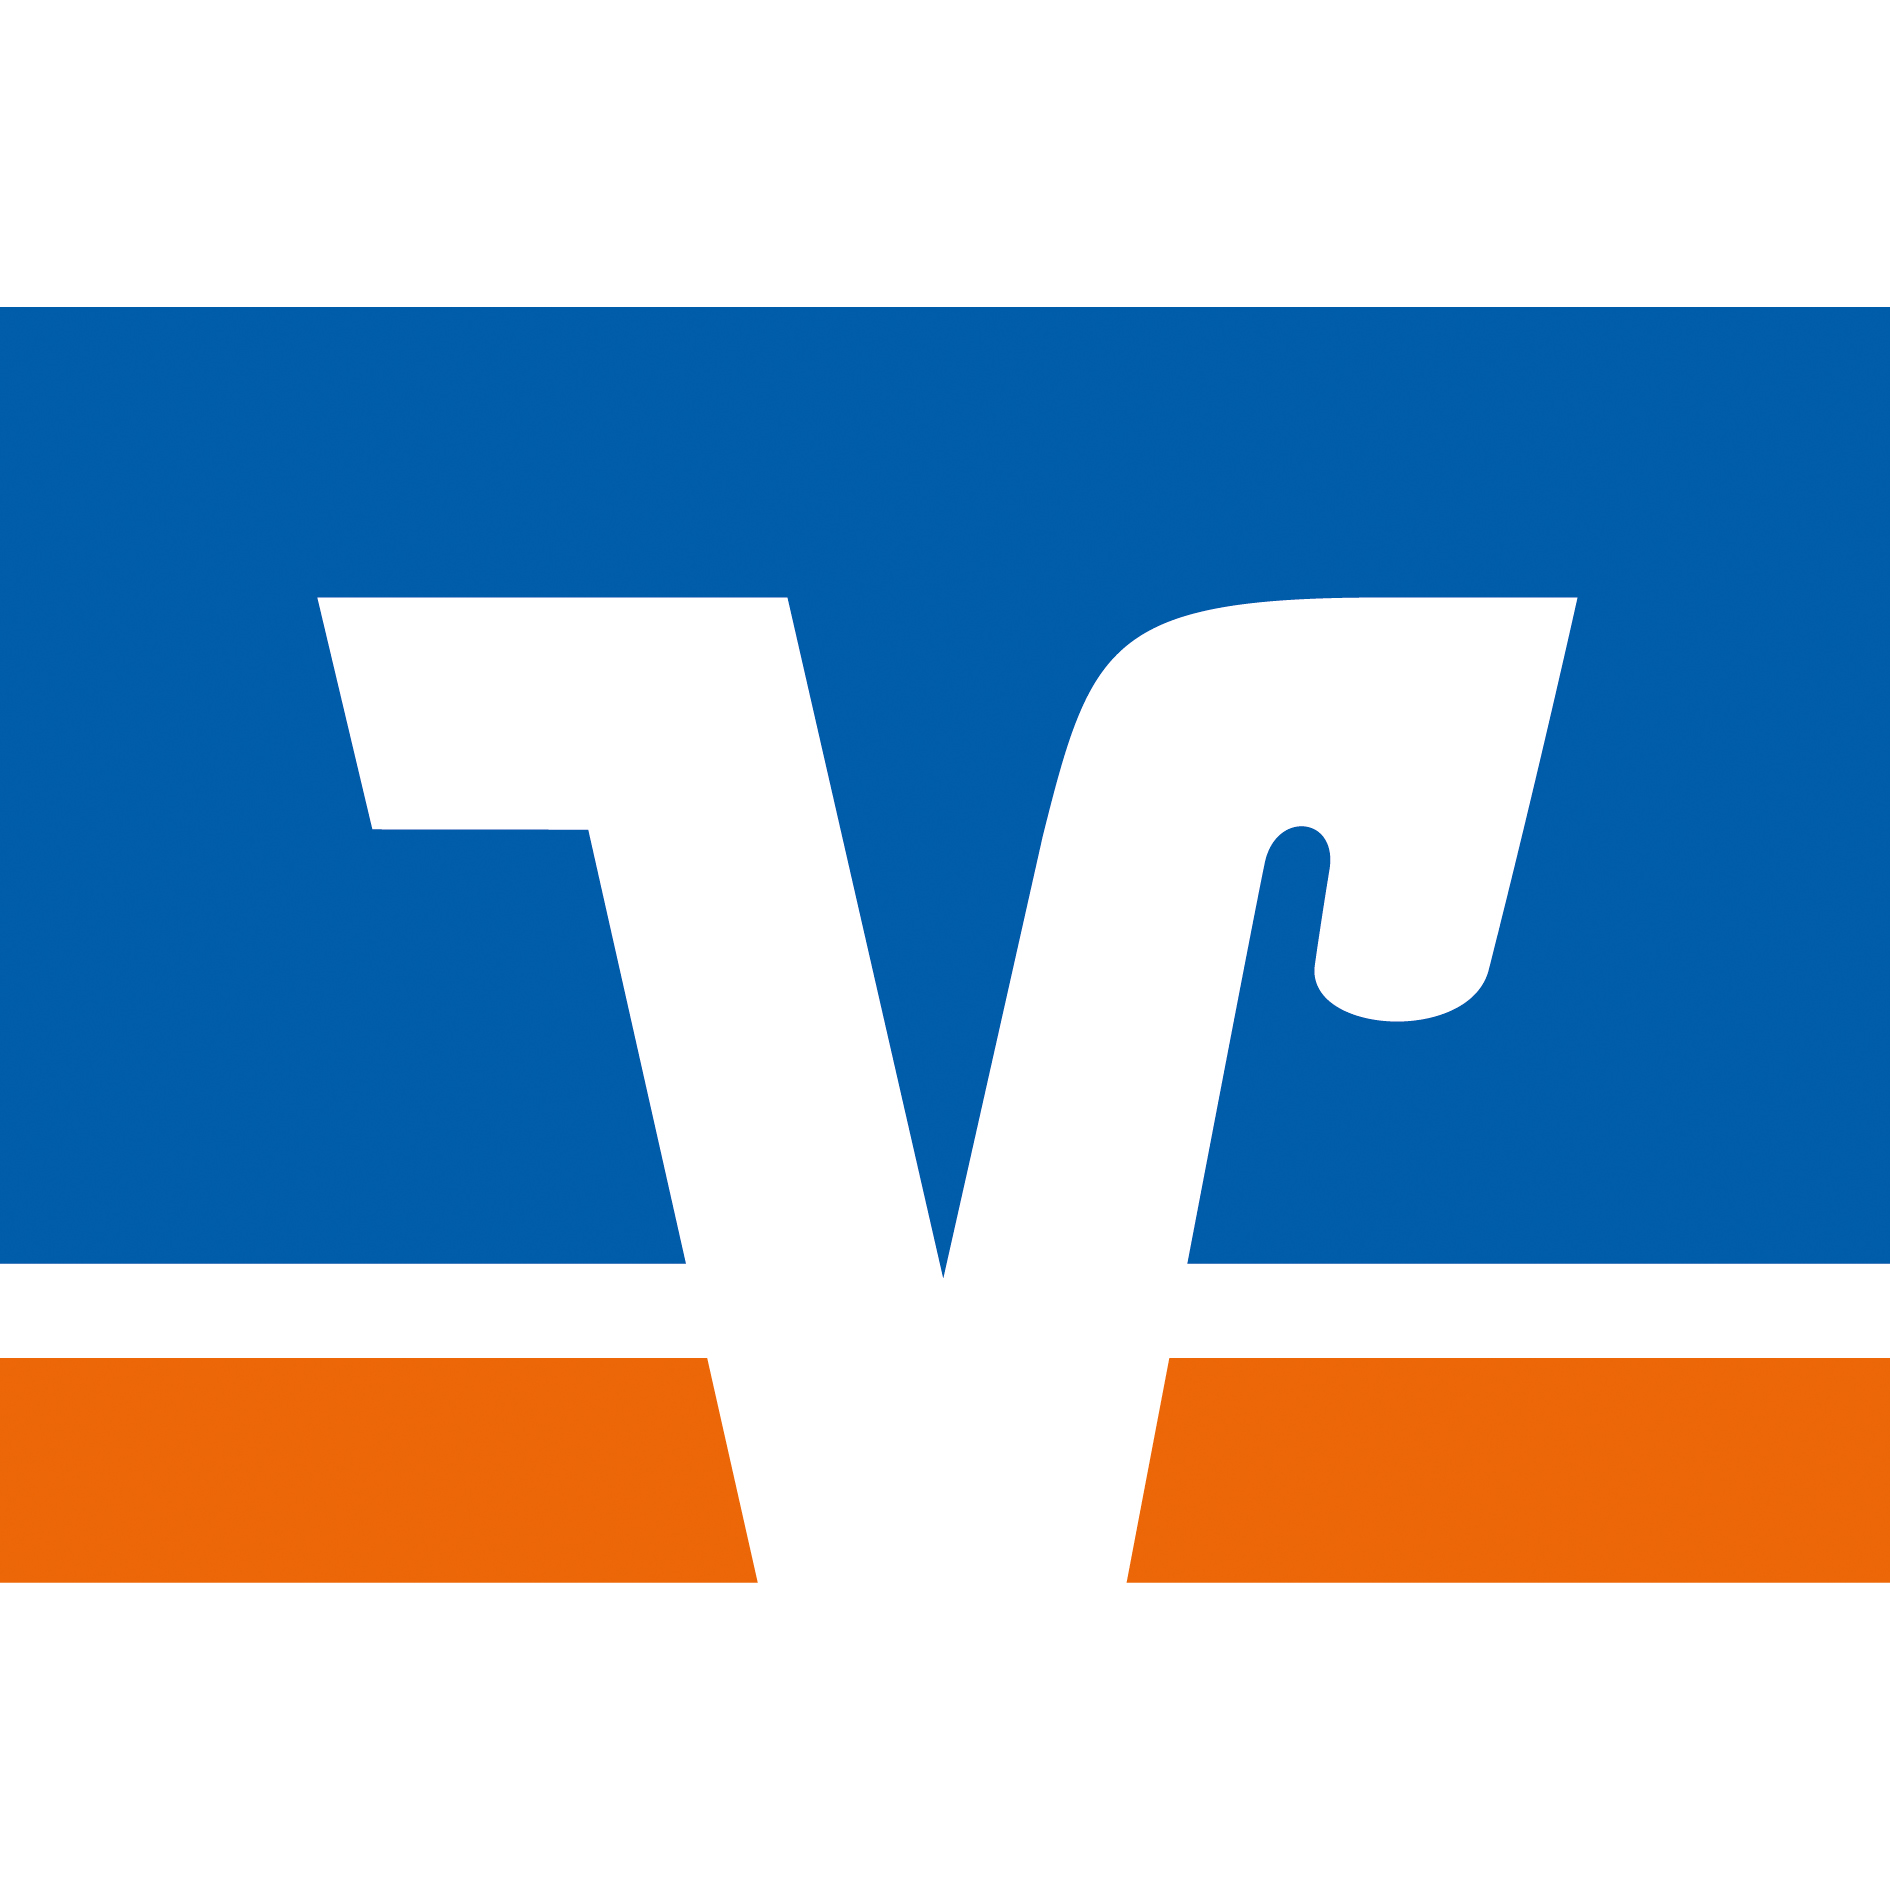 VR Immobilien GmbH, Prien